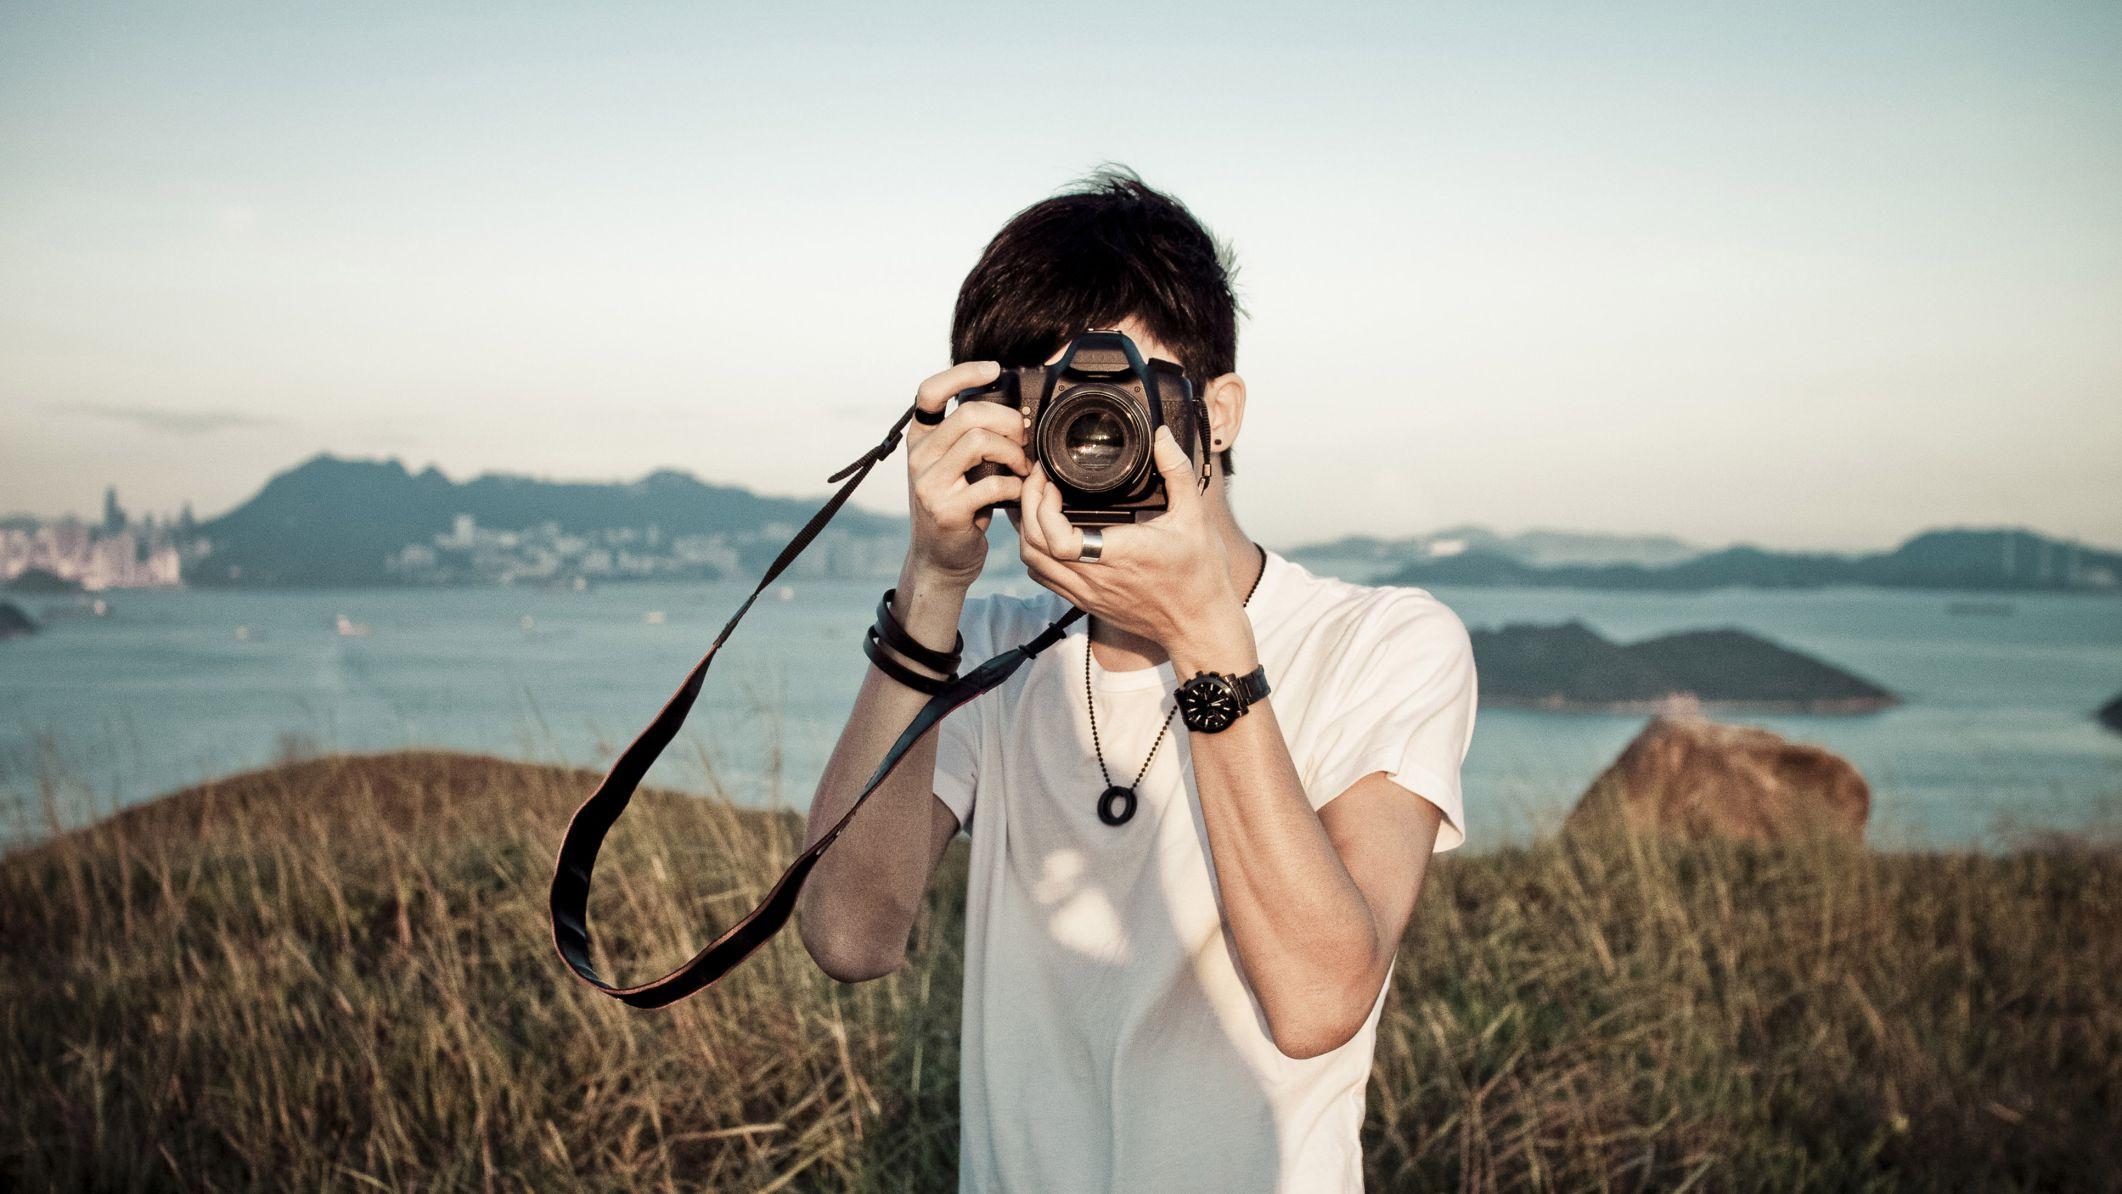 What Is A Digital Single Lens Reflex Dslr Camera